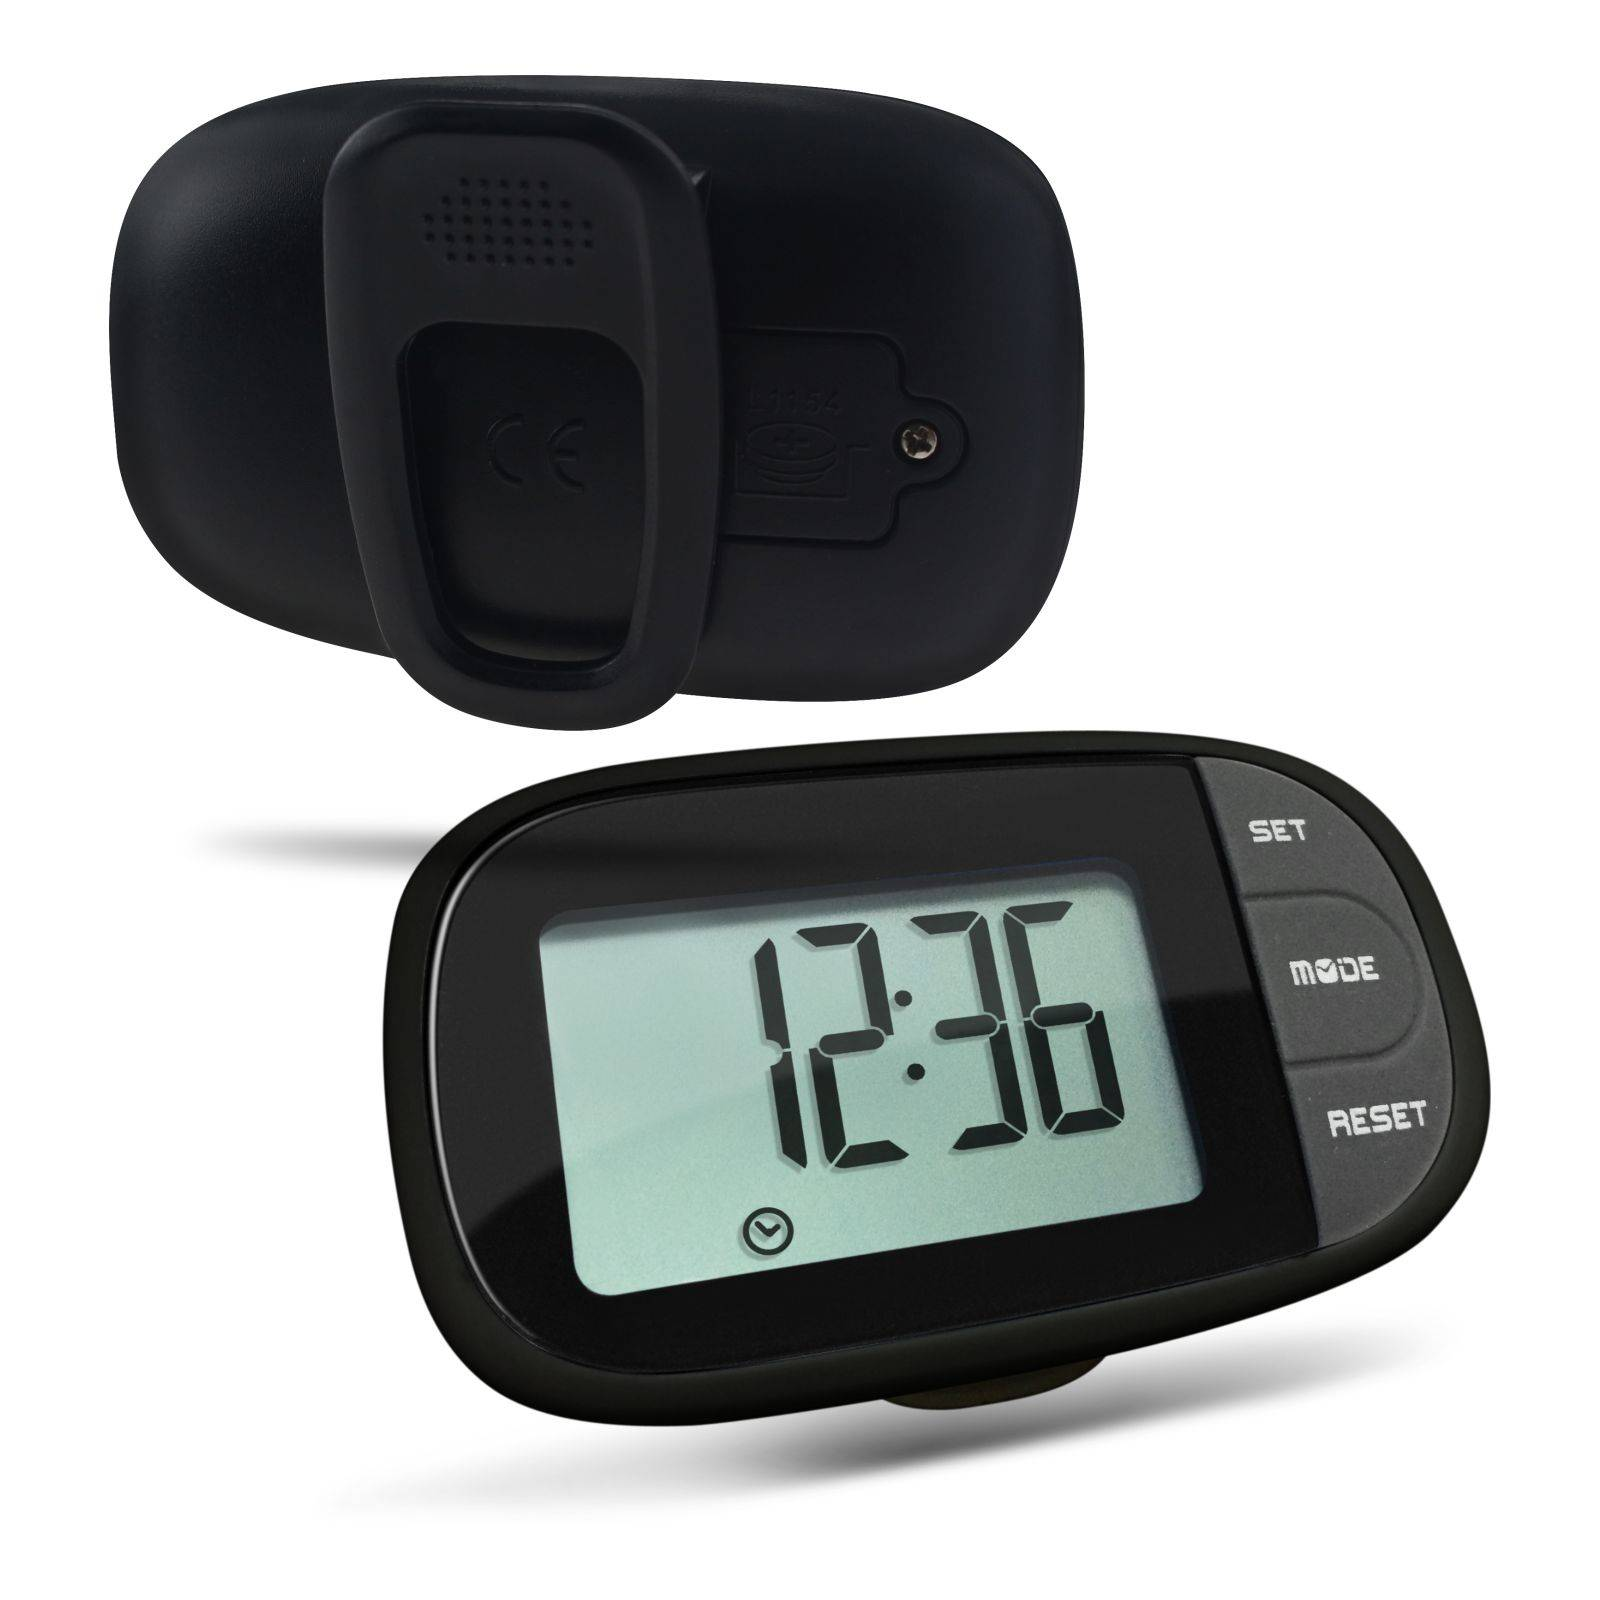 Belt clip calorie pedometer